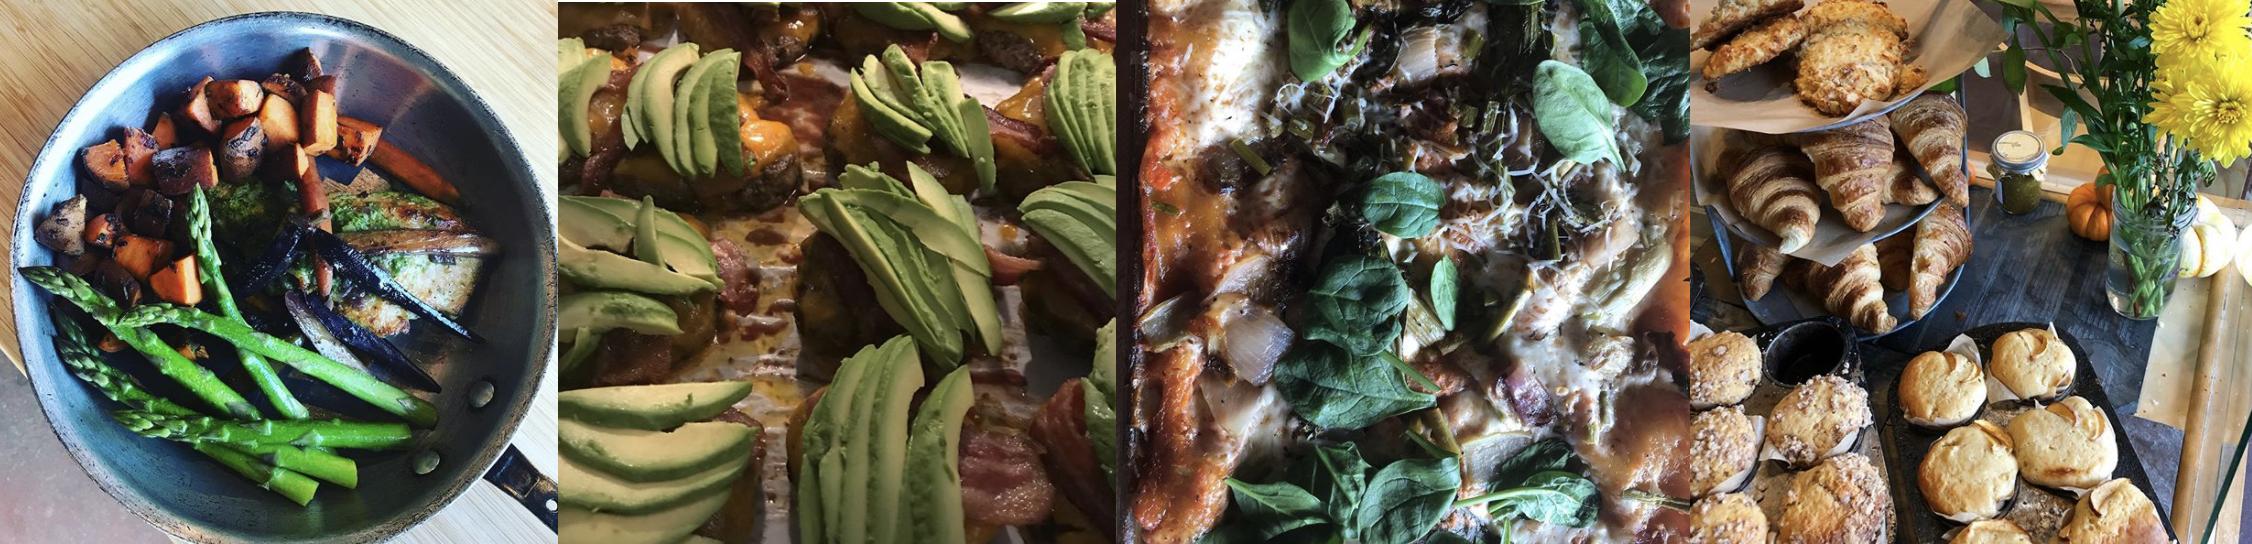 Food in Carmel